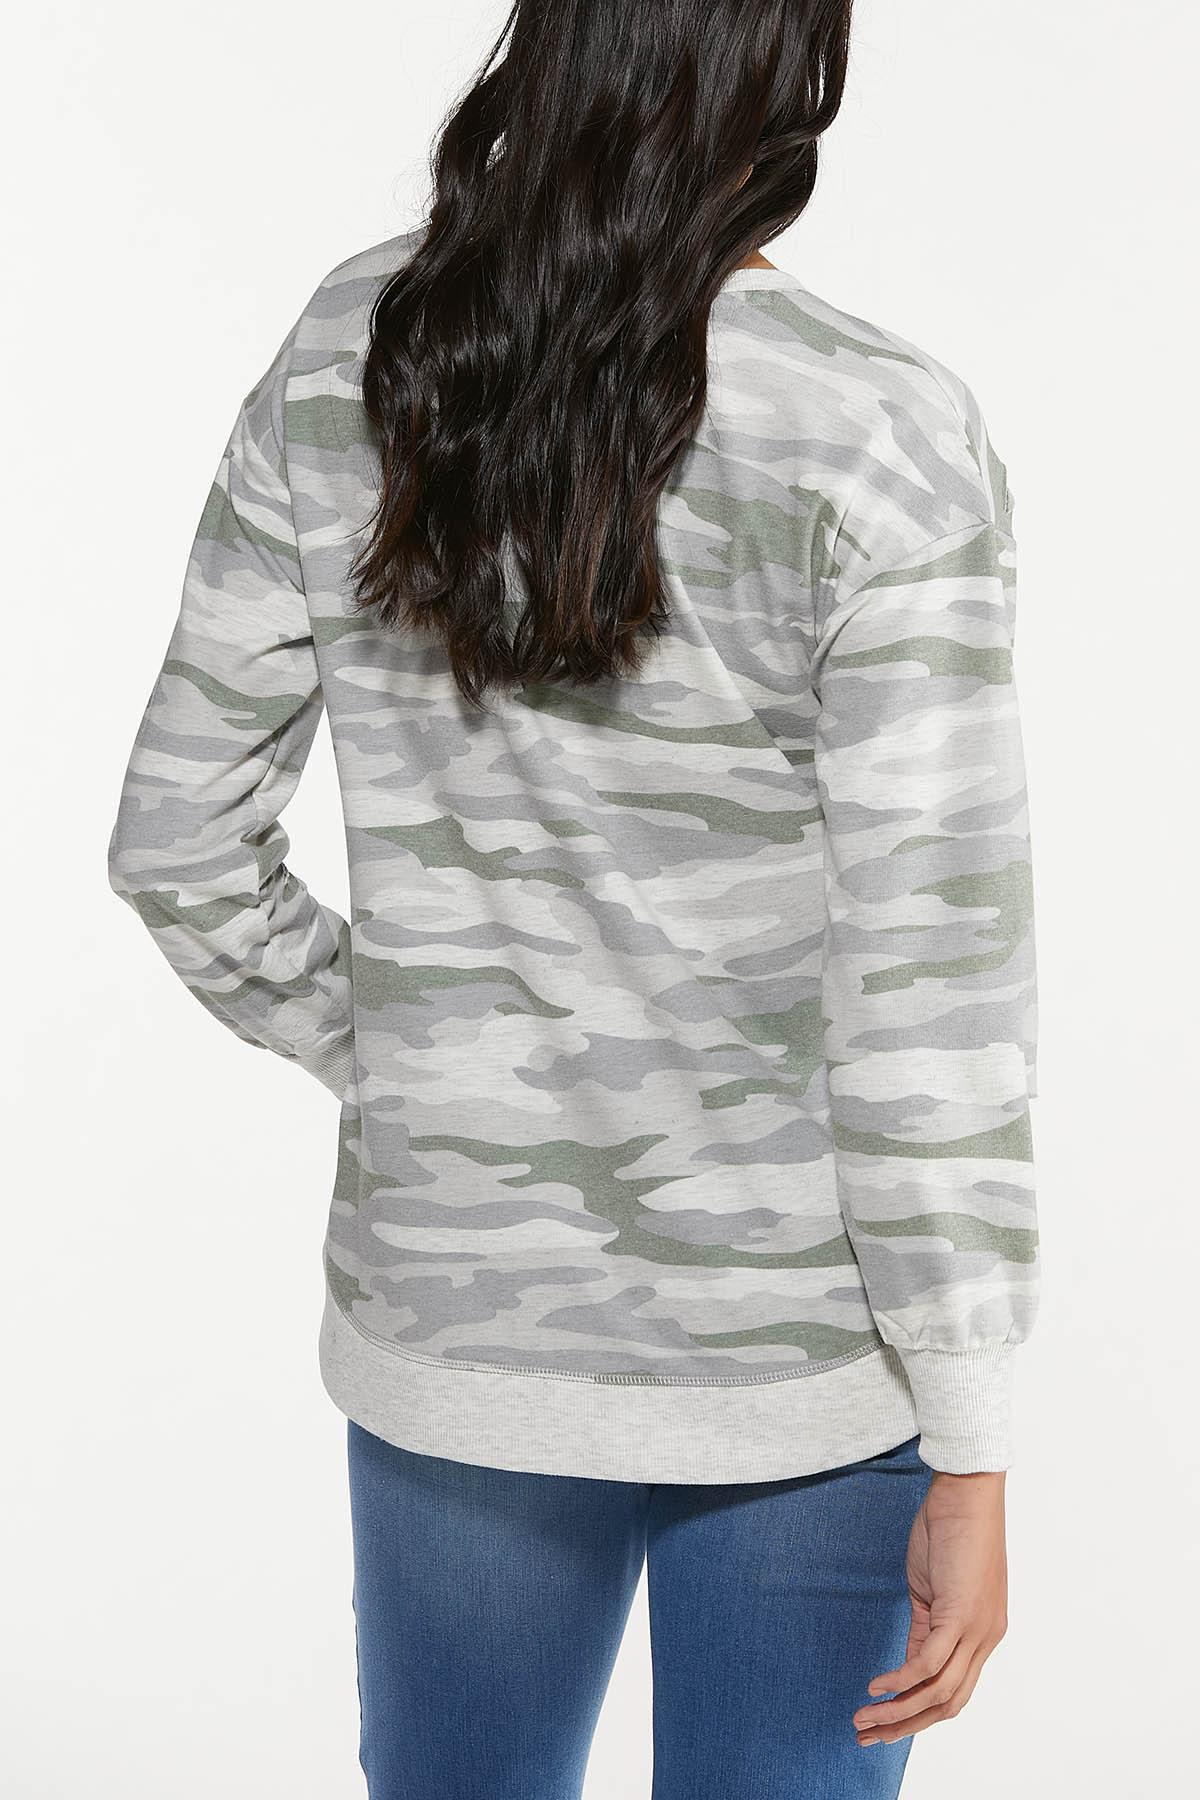 Plus Size Distressed Camo Sweatshirt (Item #44682321)